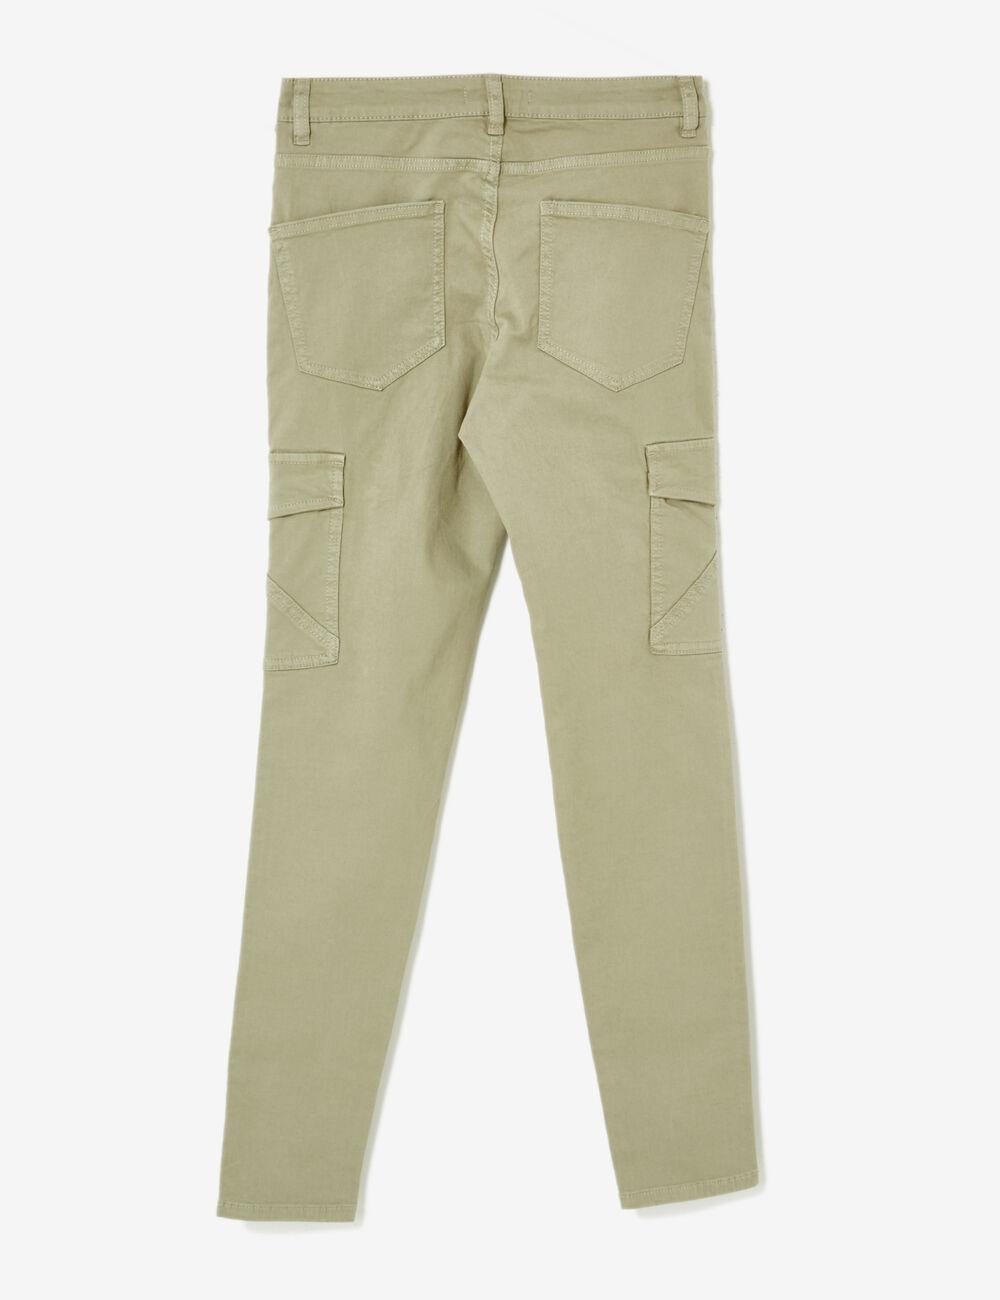 pantalon cargo poches kaki clair femme jennyfer. Black Bedroom Furniture Sets. Home Design Ideas